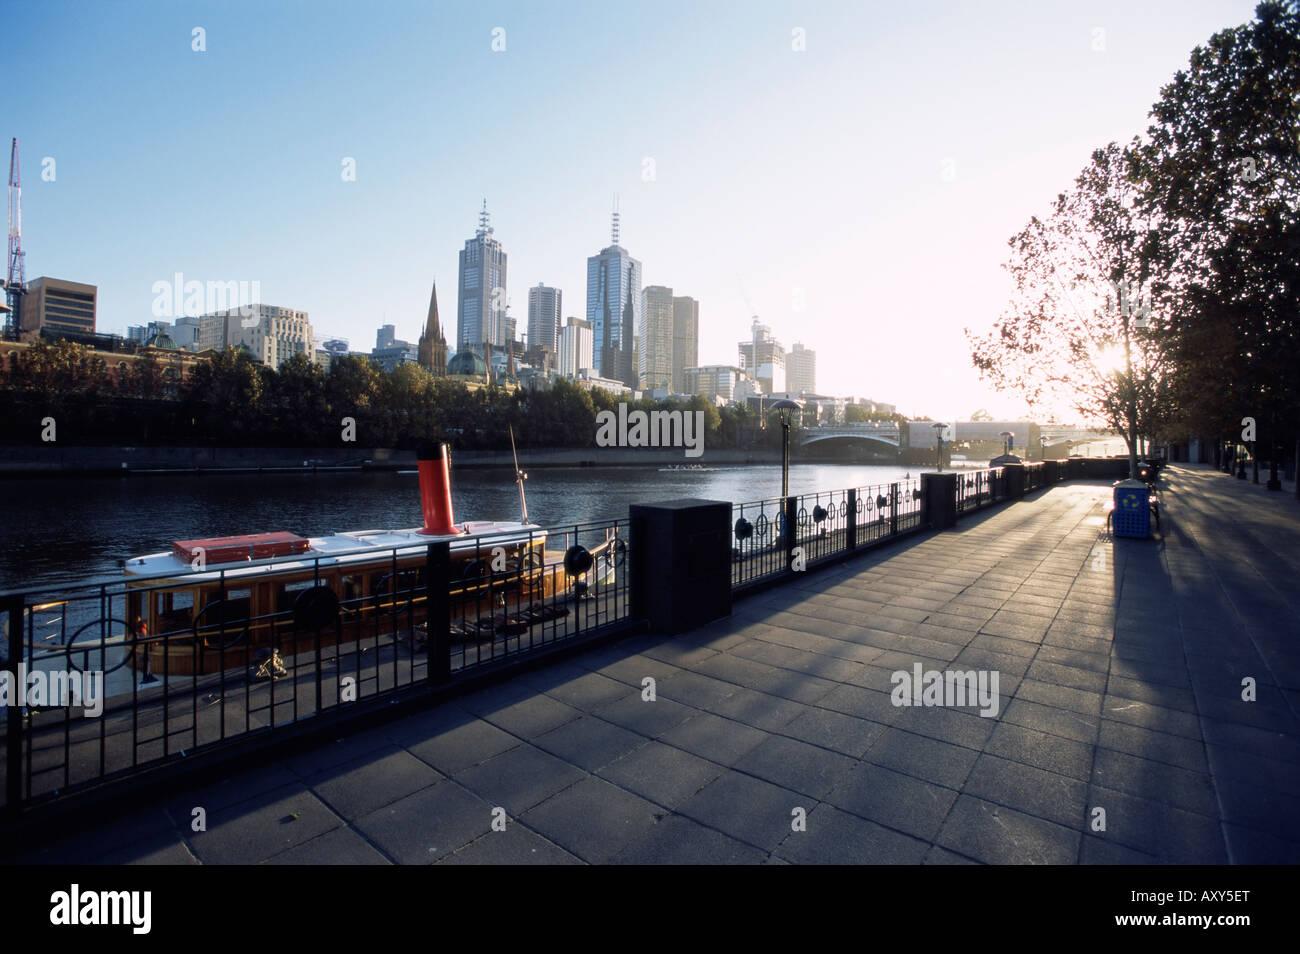 Yarra River and city skyline, Melbourne, Victoria, Australia, Pacific - Stock Image